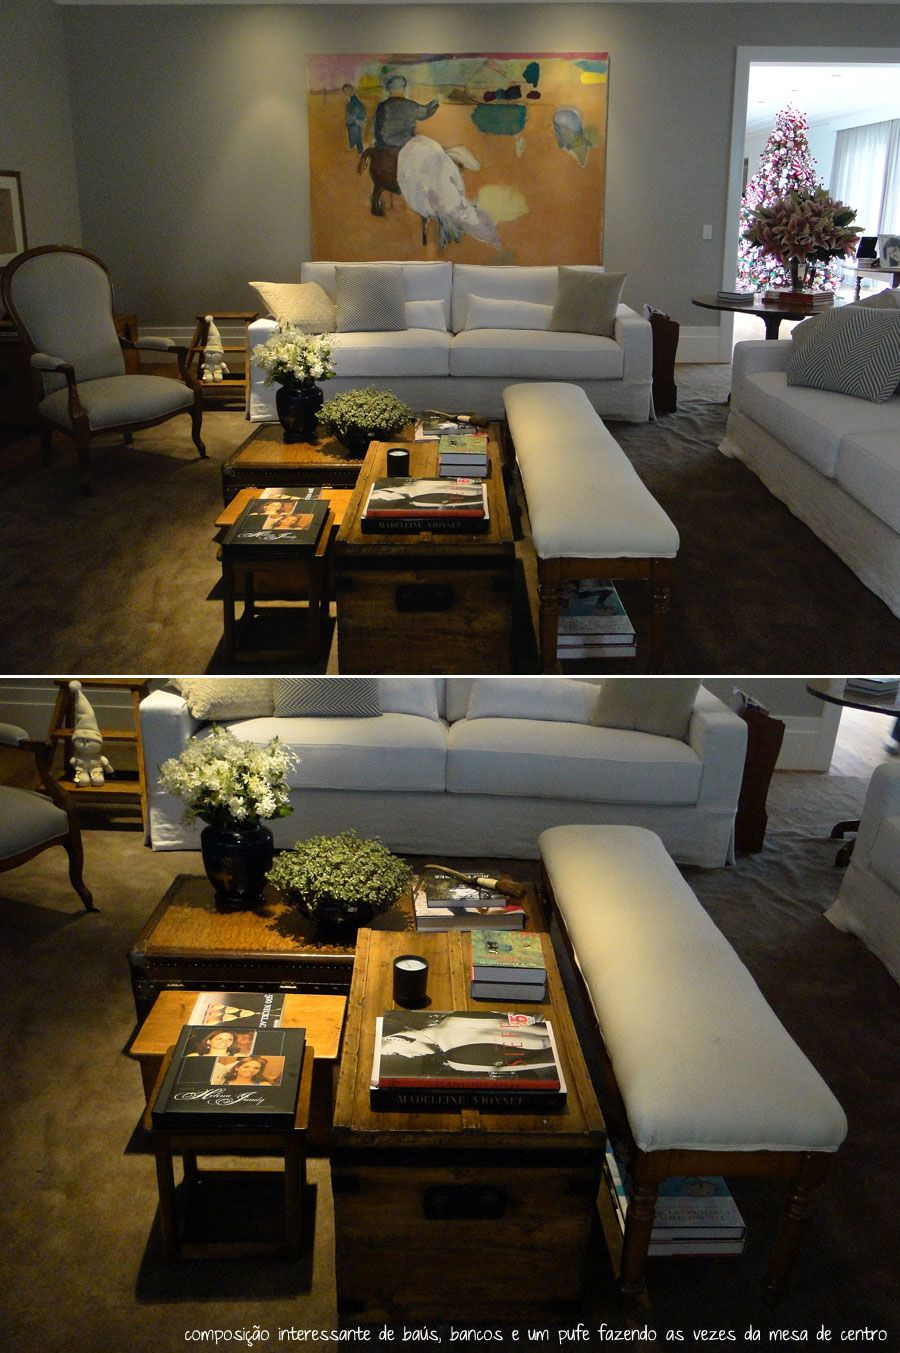 Sala de Estar em Tons Claros: Cinza e Branco